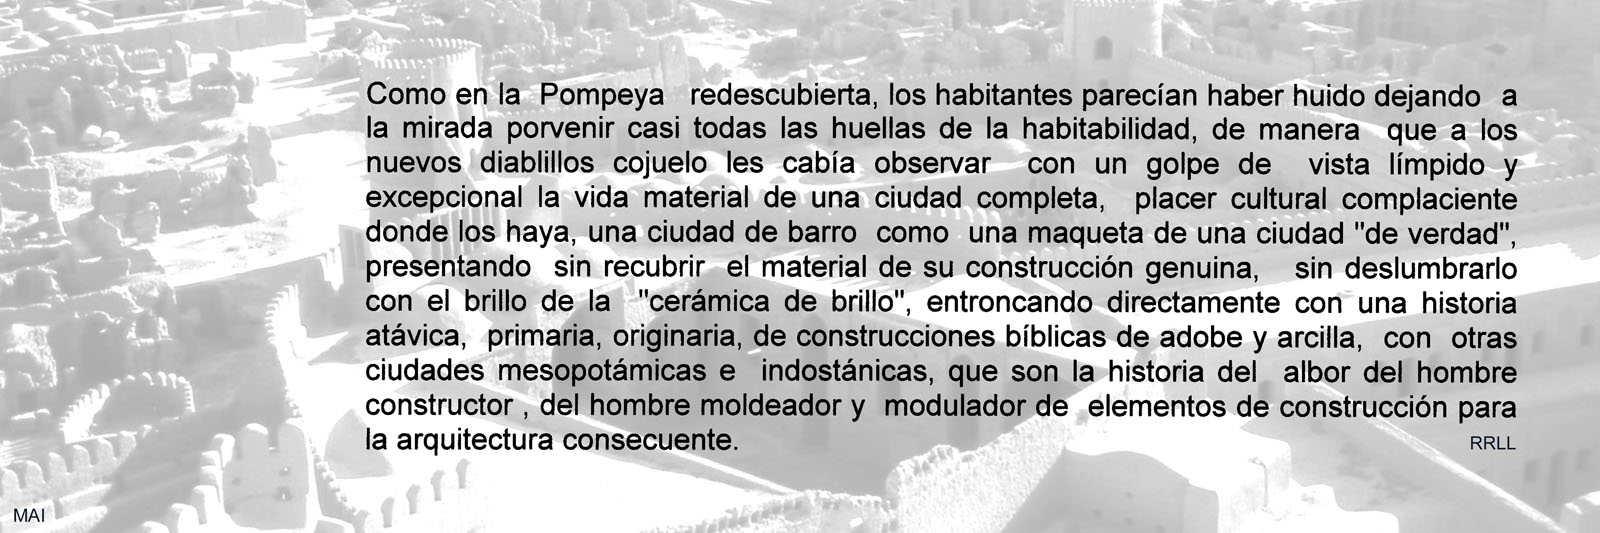 danielvillalobos-architecturalexhibition-bam-architectureofmud-73